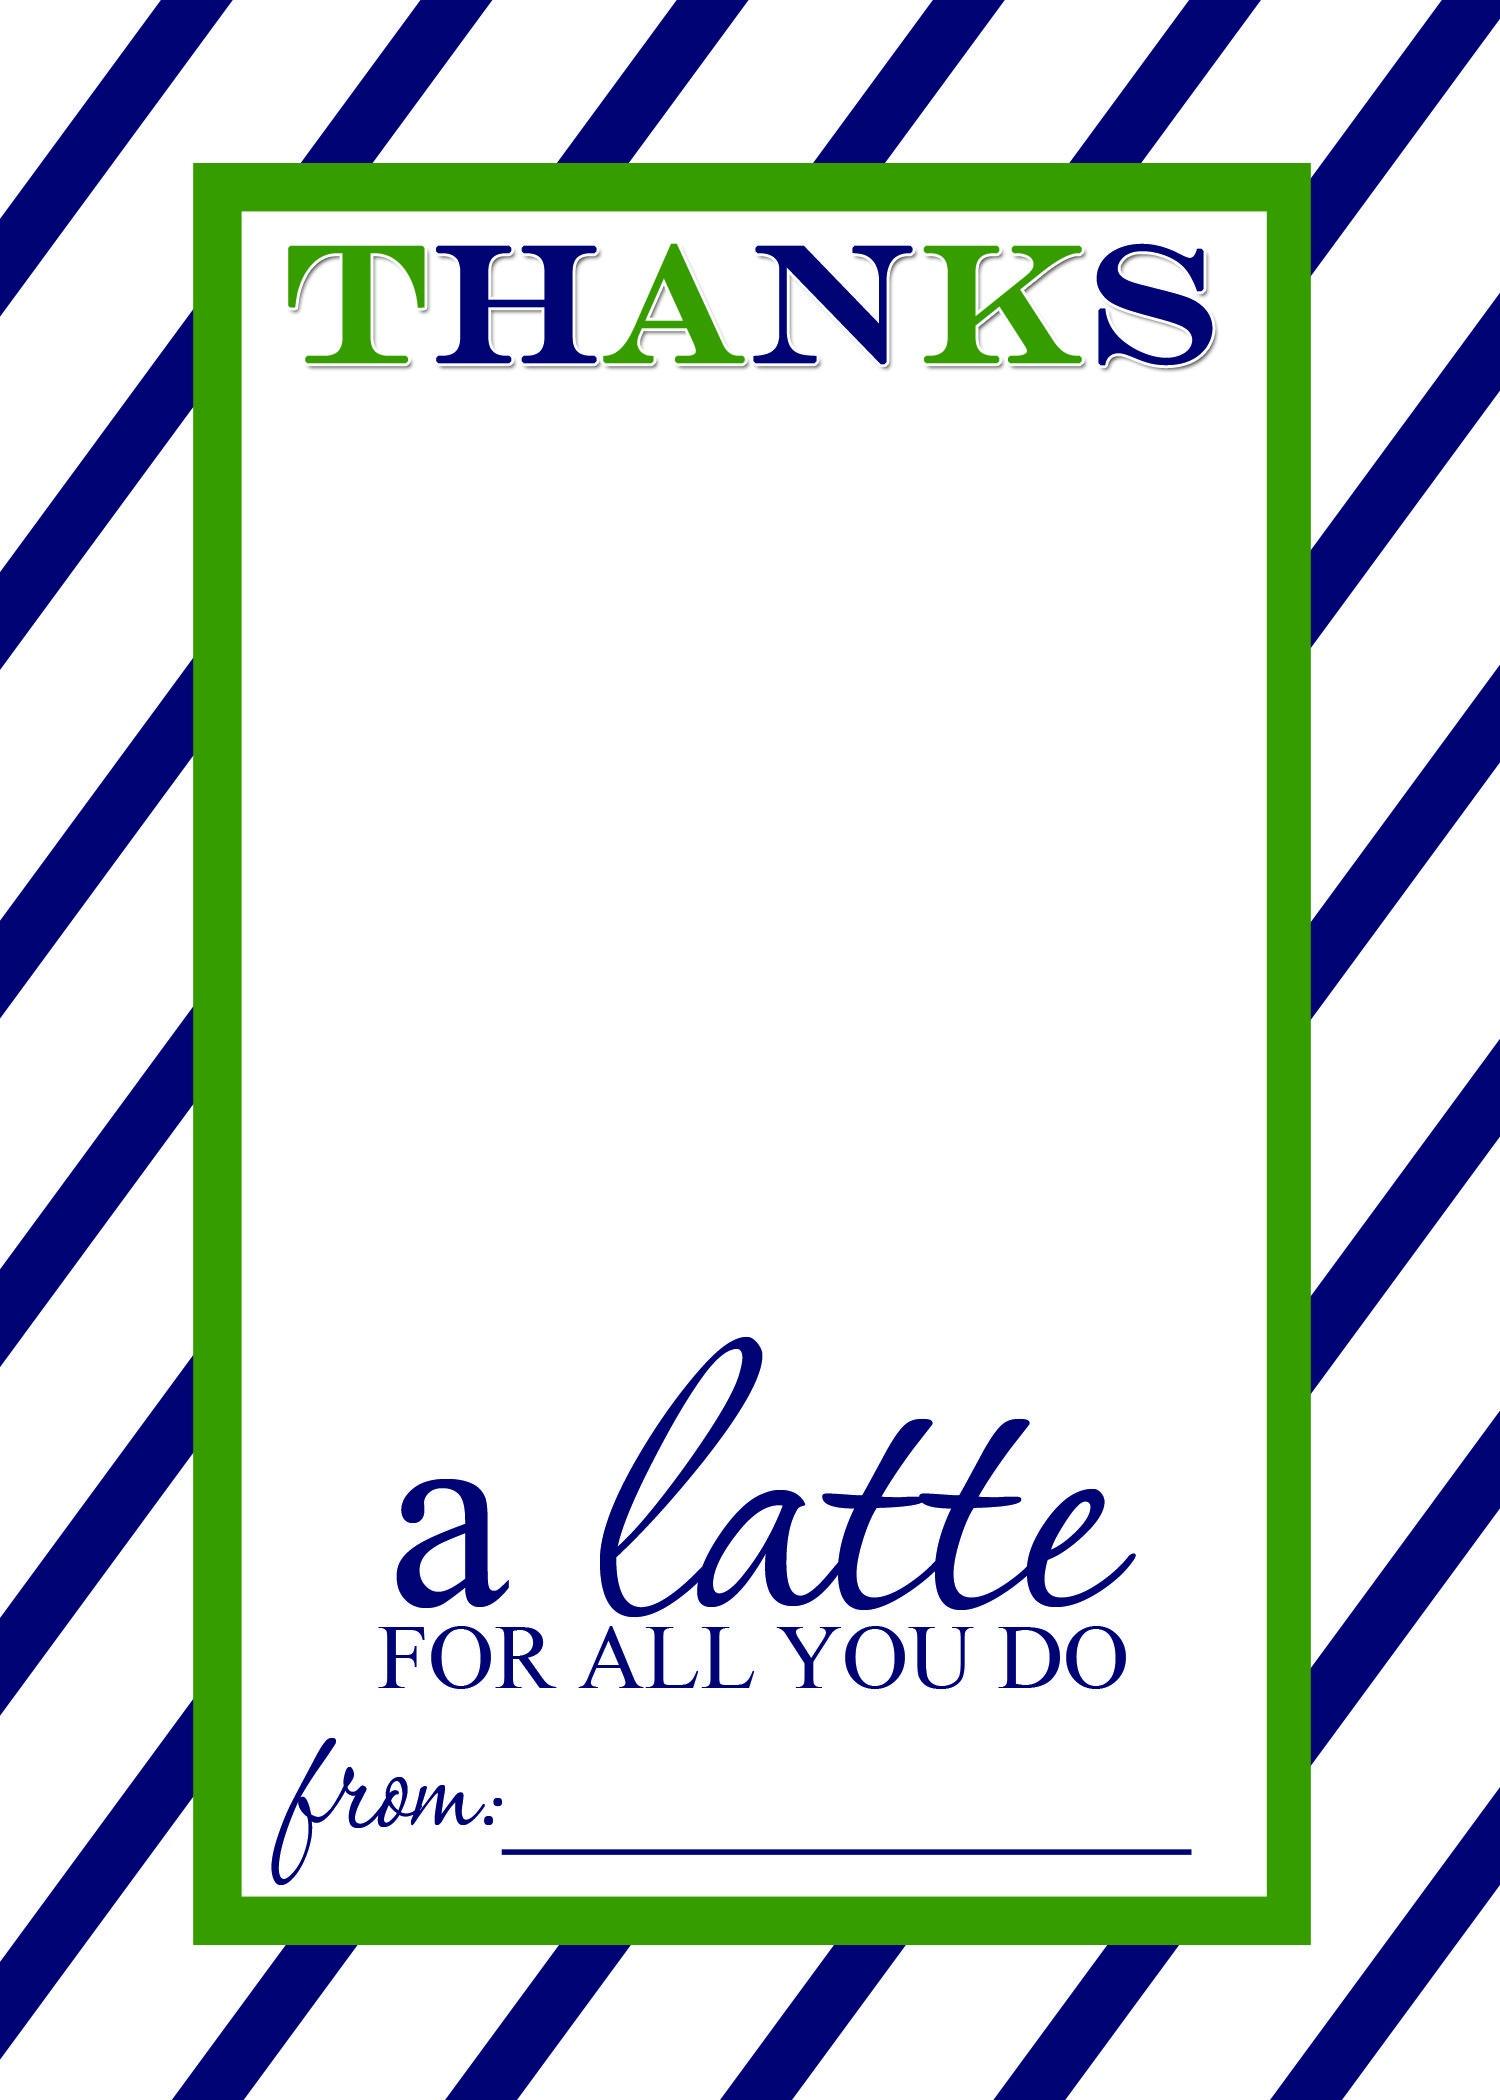 Thanks A Latte Free Printable Gift Card Holder Teacher Gift | Las - Thanks A Latte Free Printable